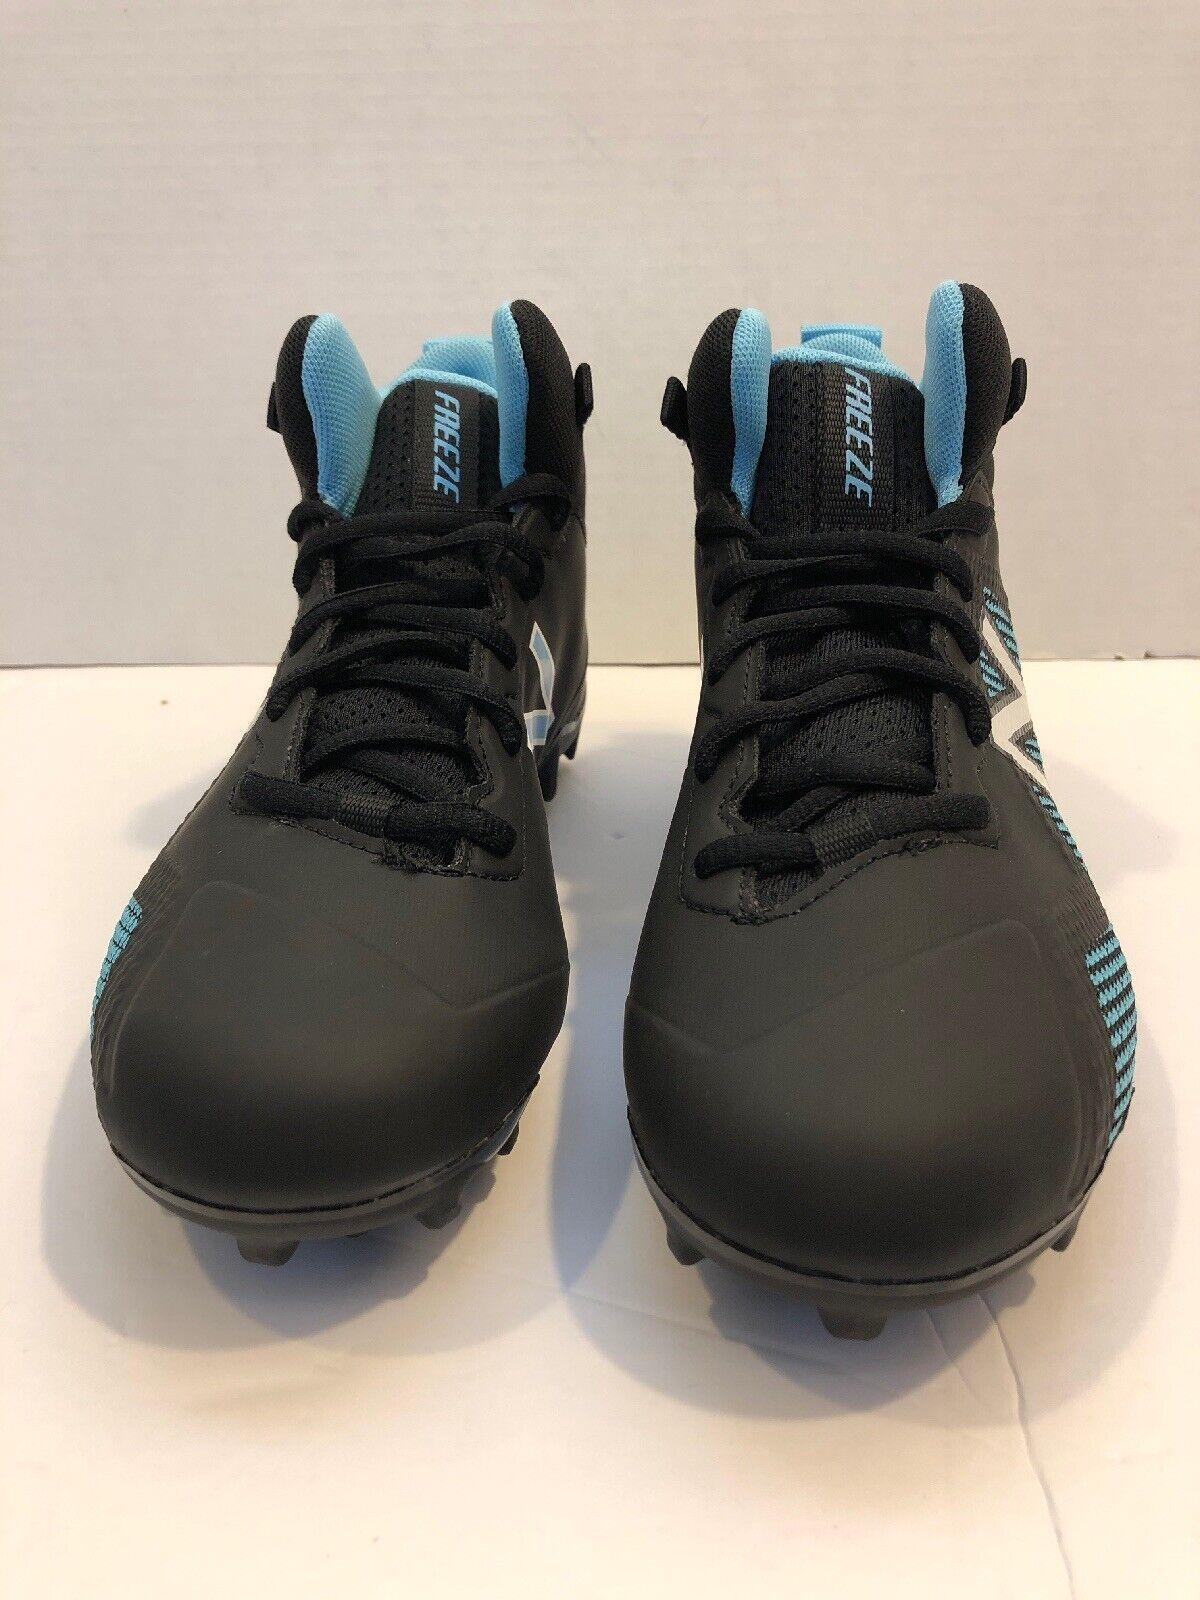 New Balance FREEZE Lacrosse Cleats Kids shoes Size 4.5 FREEZJBK